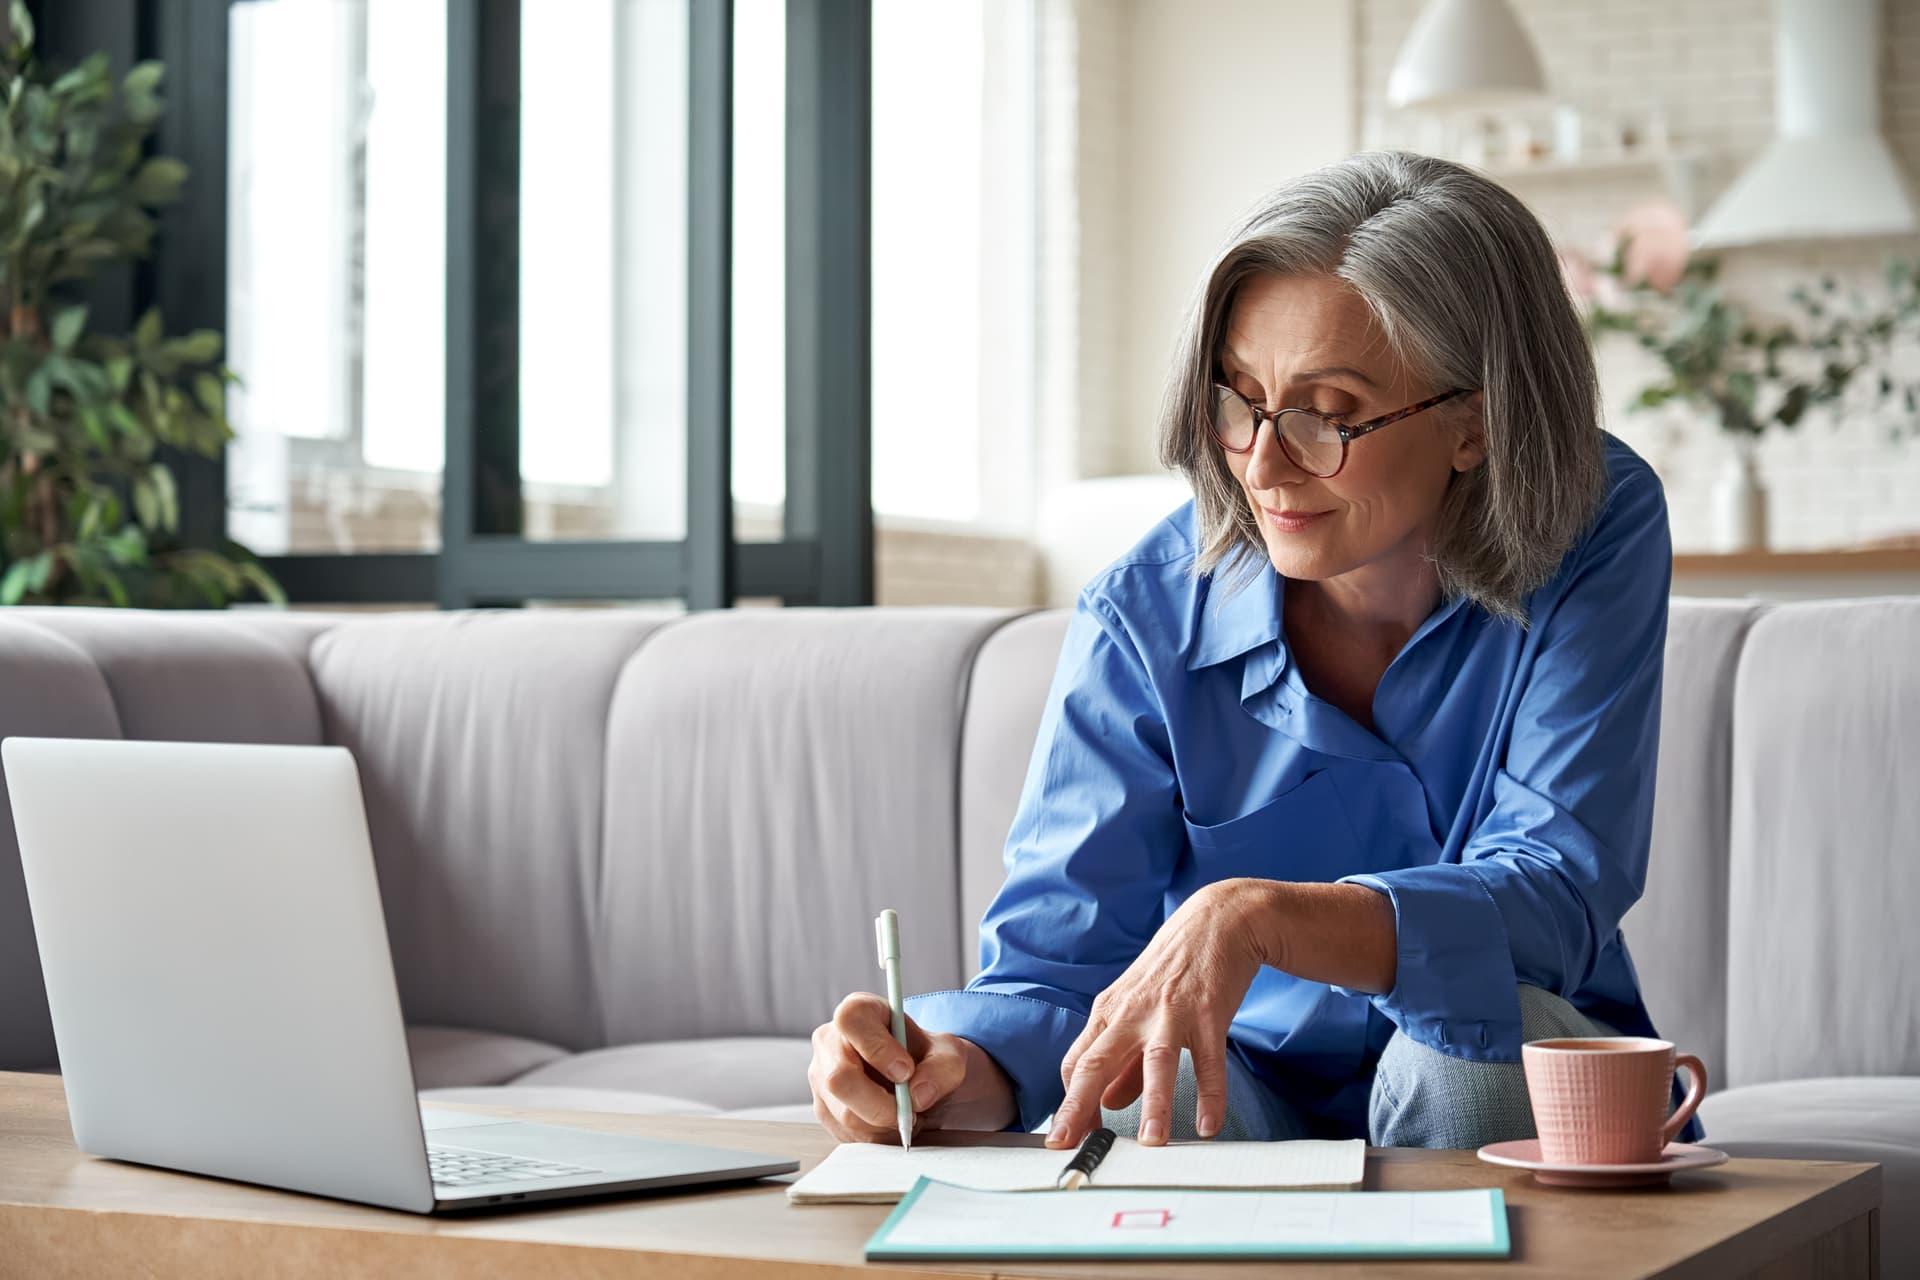 Frau lernt an einem Notebook